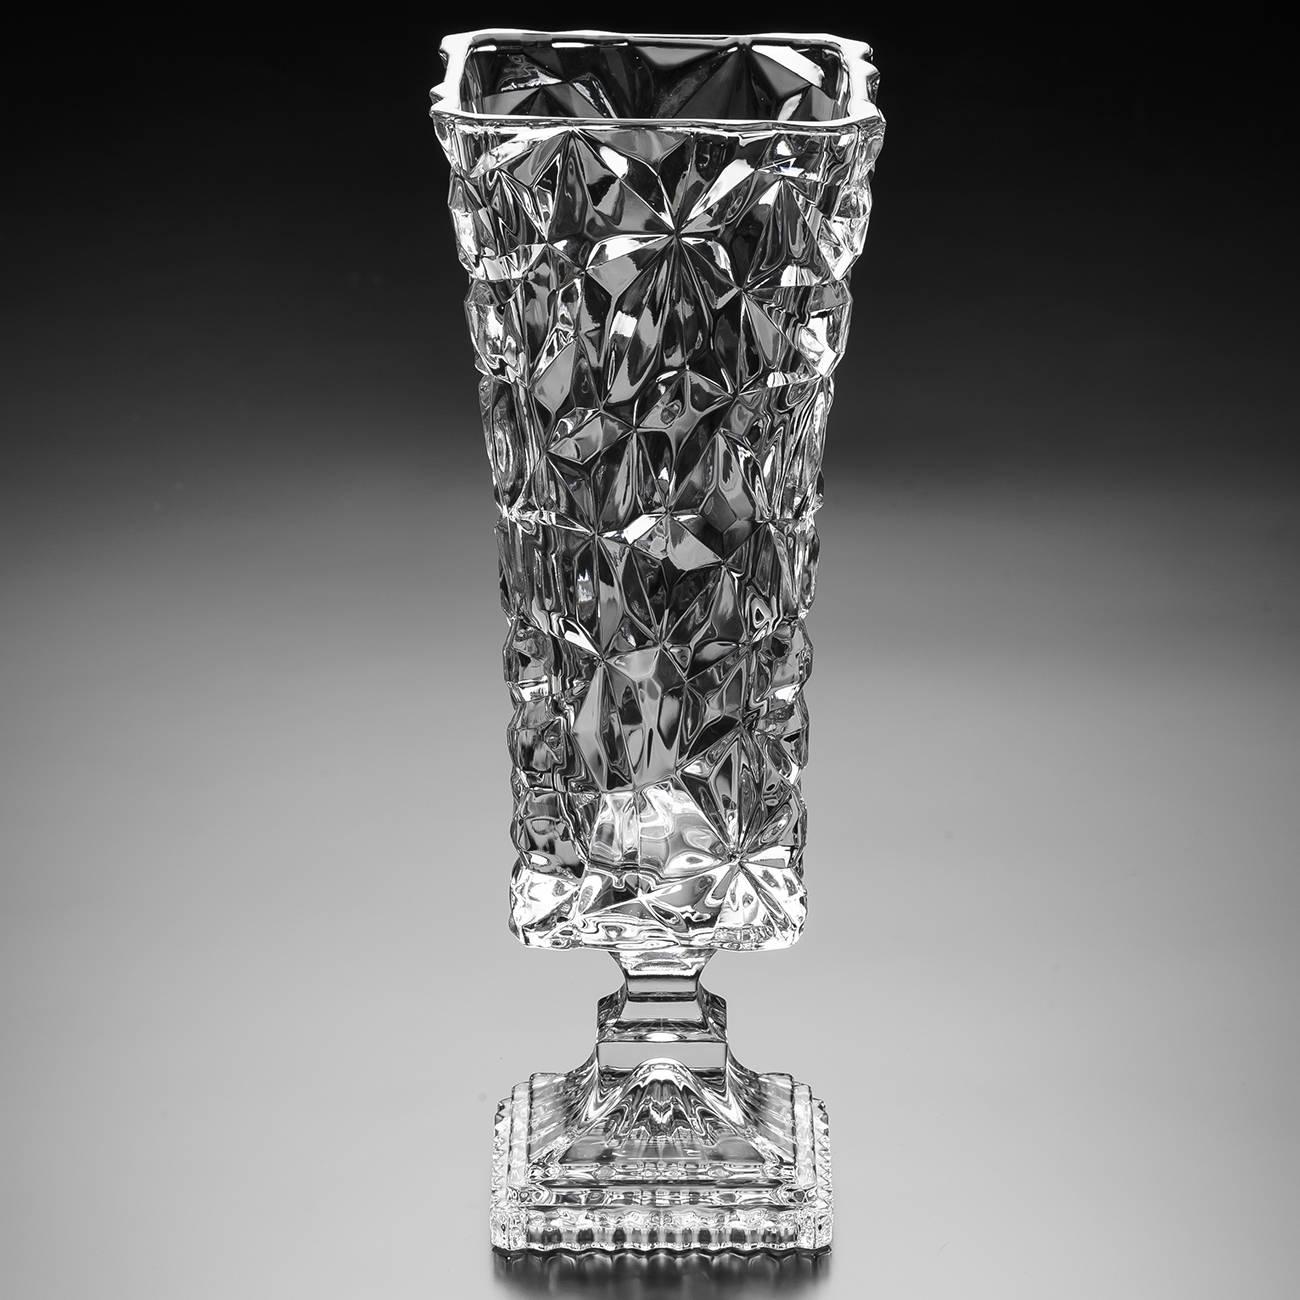 Vaso Ice Rock Pedestal em Cristal - Wolff - 42 cm